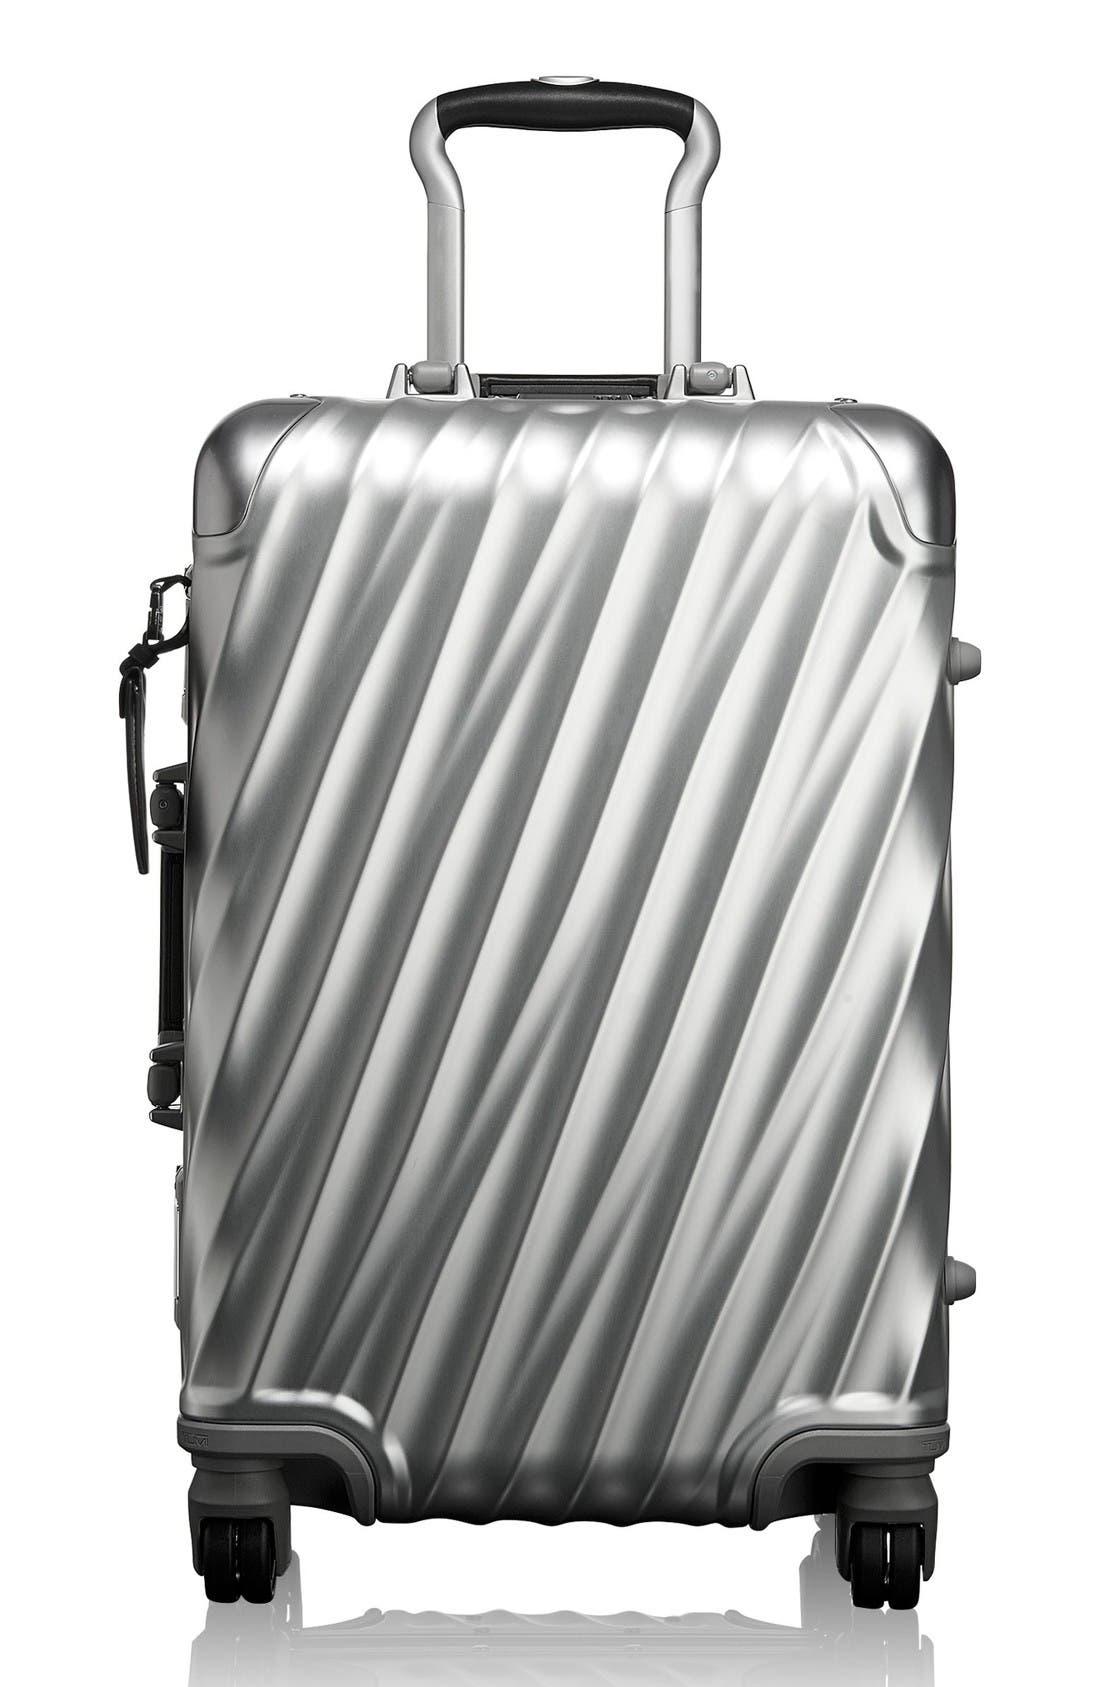 Alternate Image 1 Selected - Tumi 19 Degree Collection International Wheeled Aluminum Carry-On